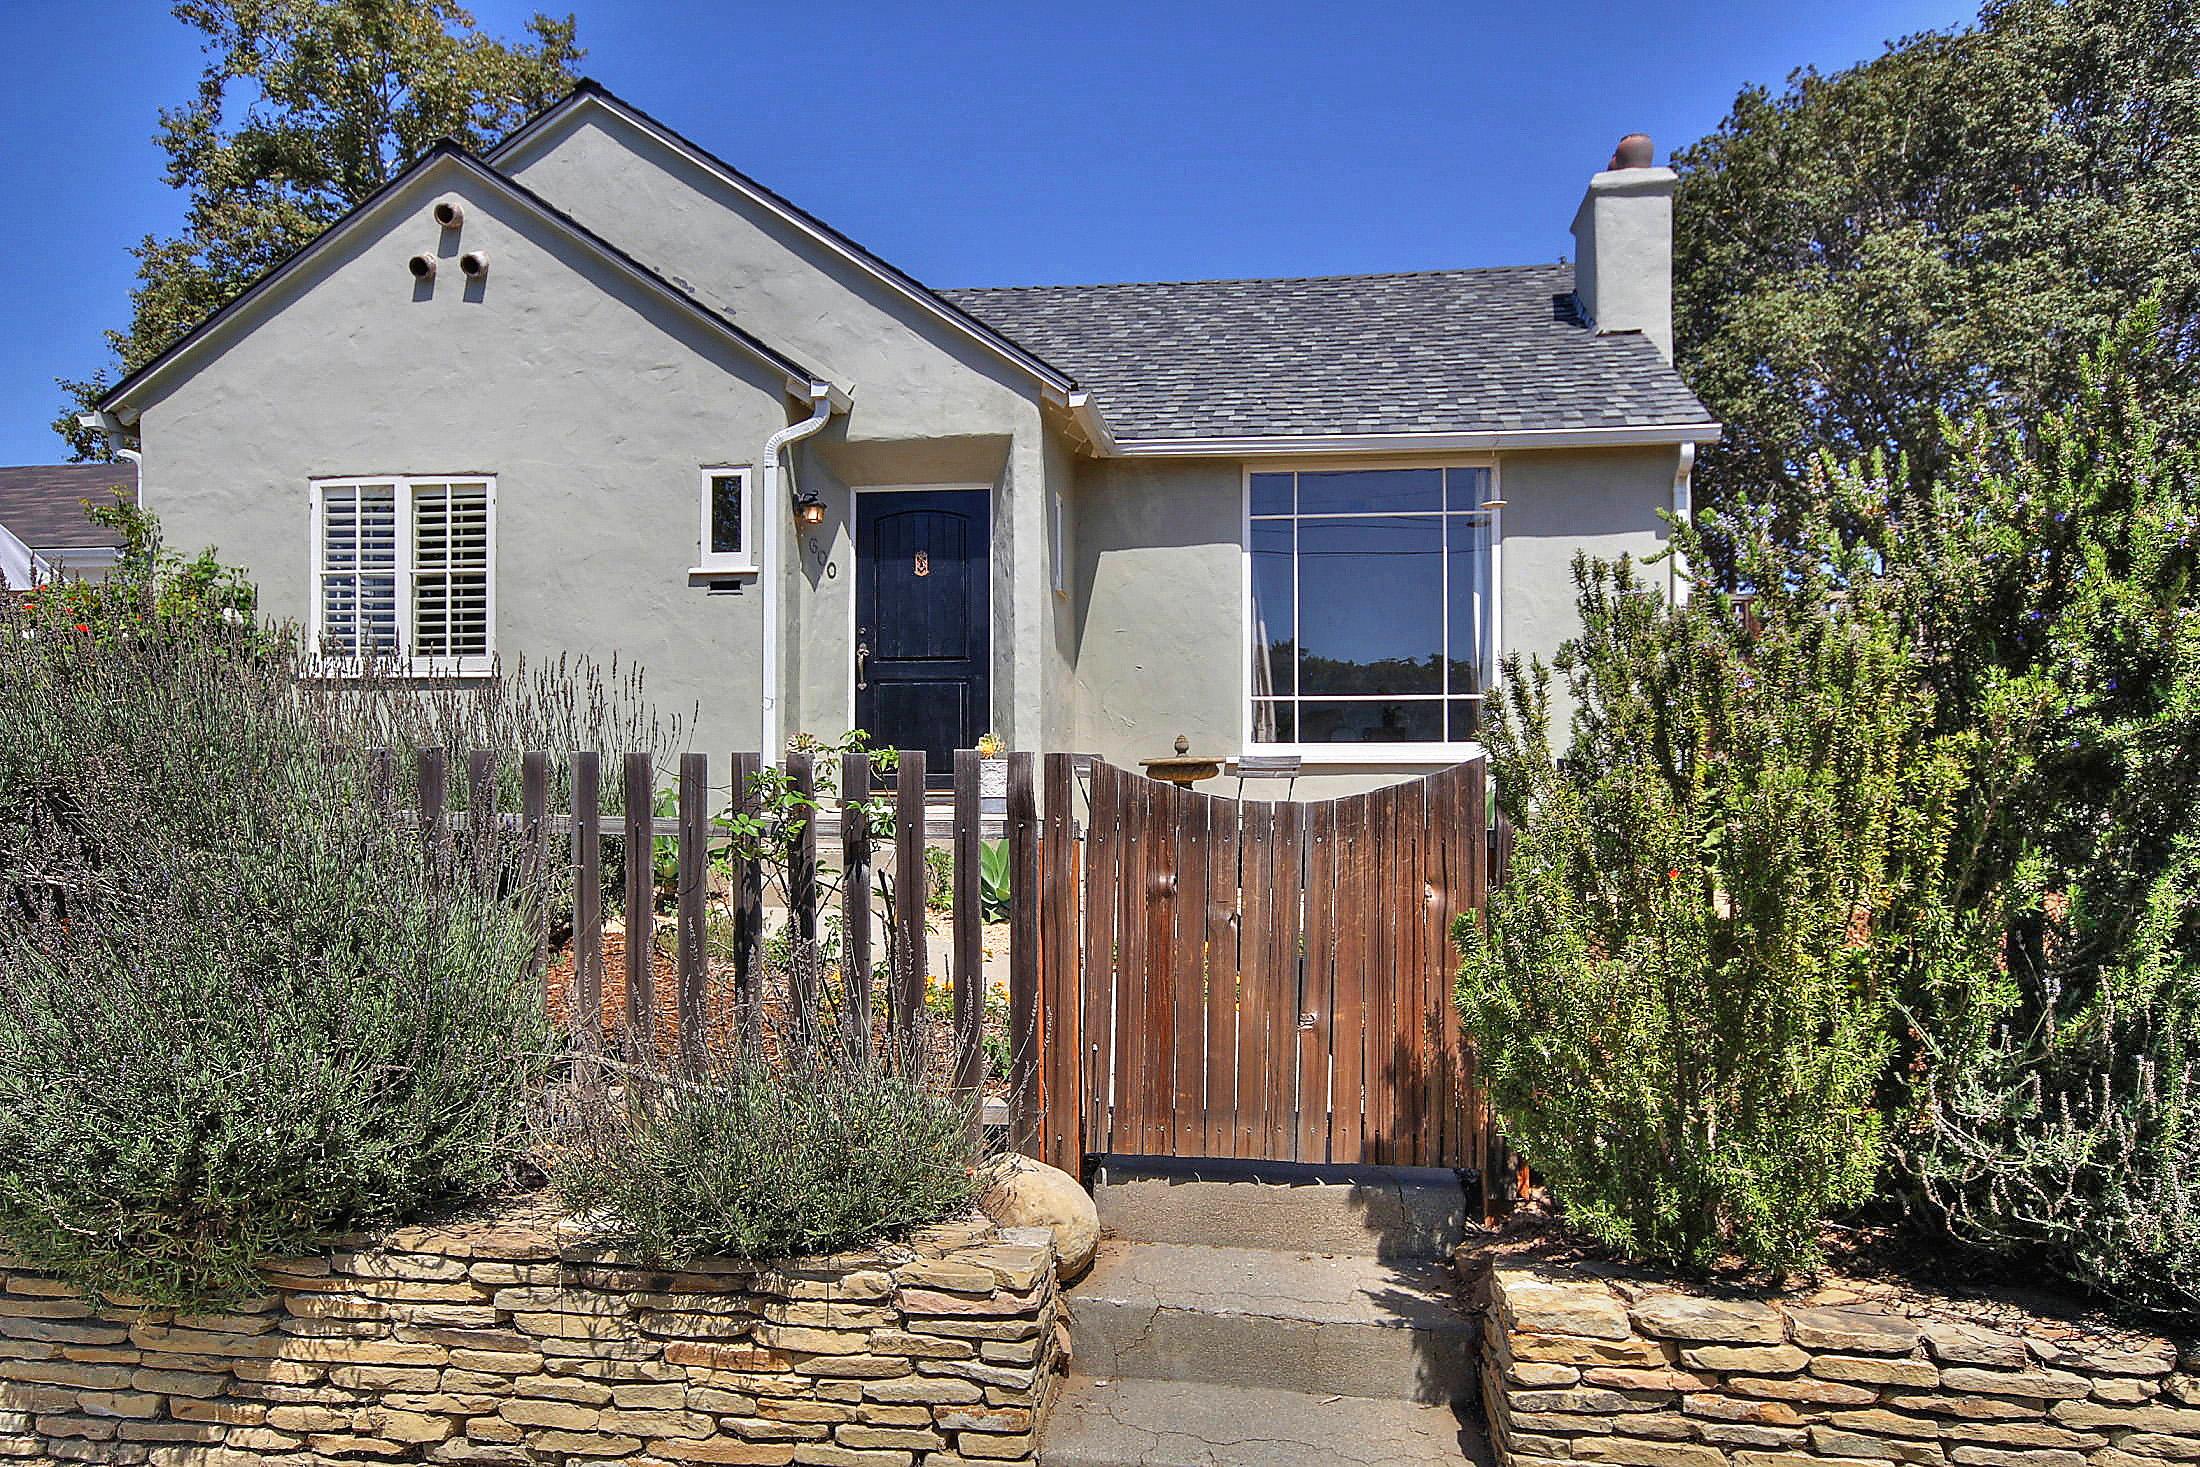 Property photo for 600 W Islay St Santa Barbara, California 93101 - 15-3844